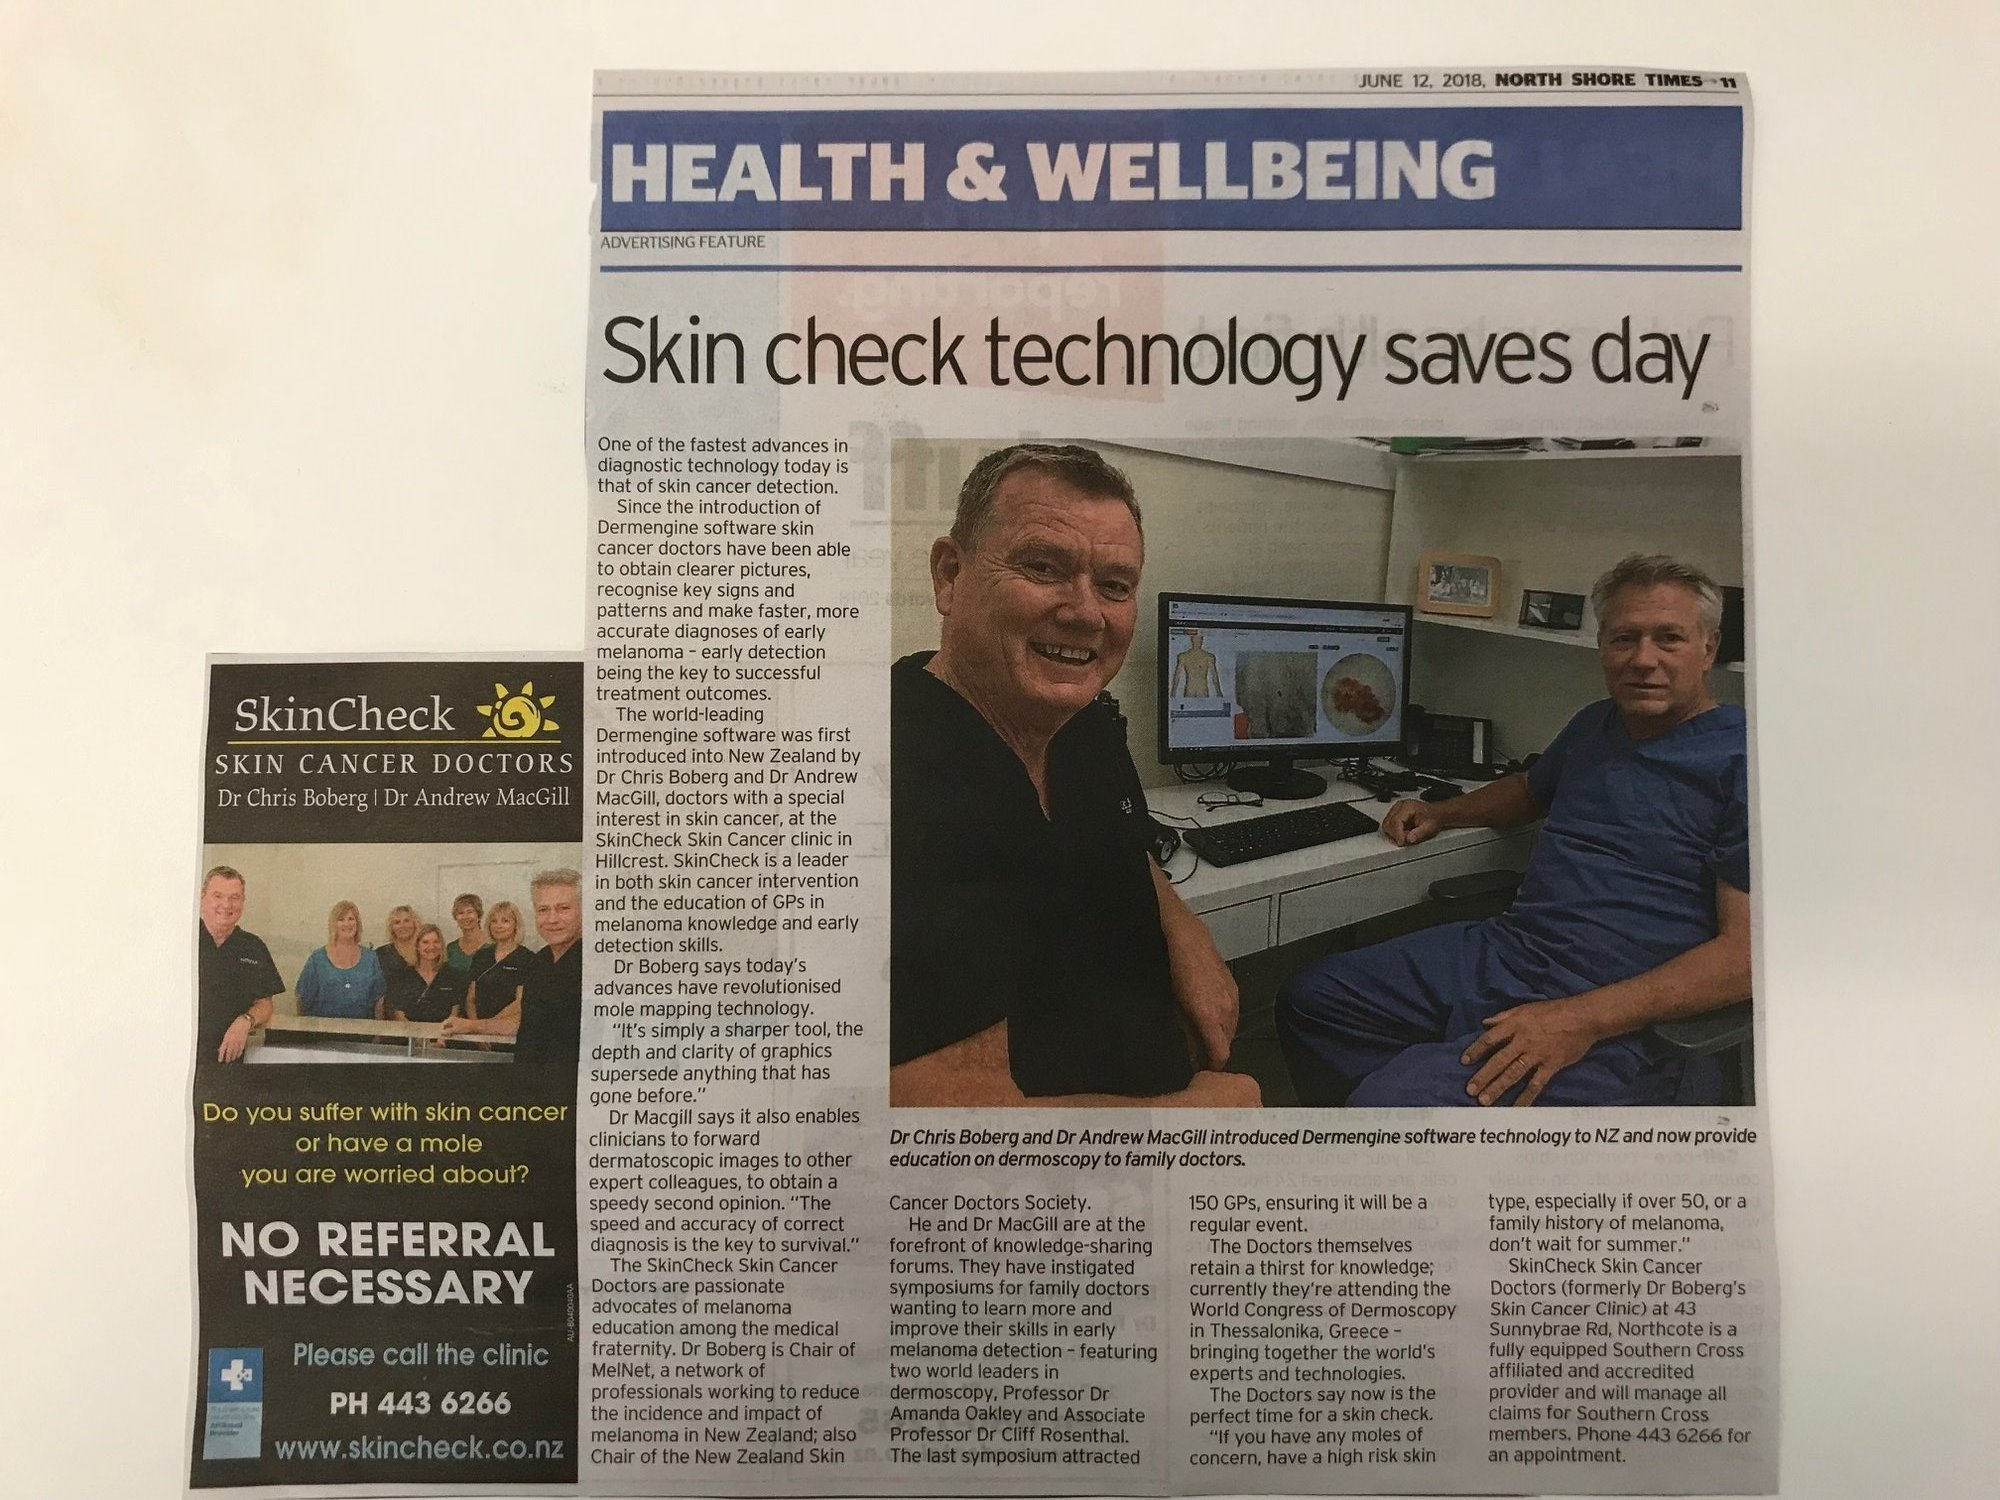 SkinCheck-skin-cancer-clinic-Technology+saves+day+2.jpg